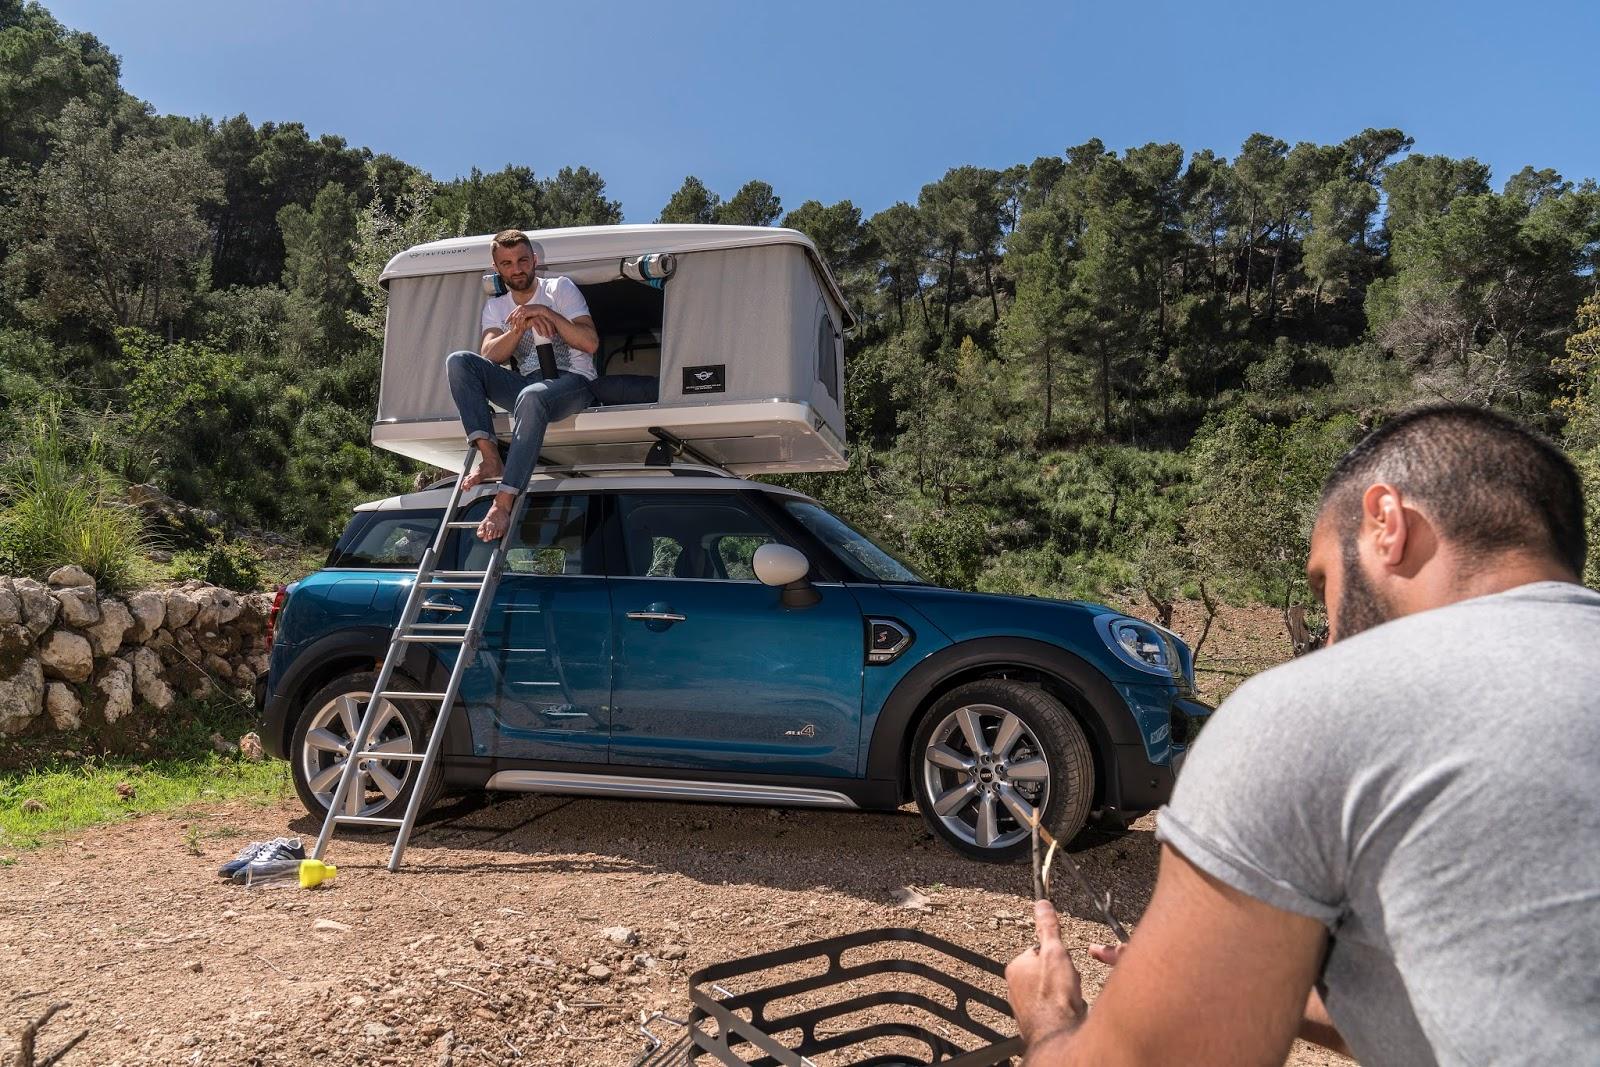 P90258020 highRes the autohome roof te Το MINI Countryman έχει και... σκηνή οροφής Mini, MINI Cooper Countryman, SUV